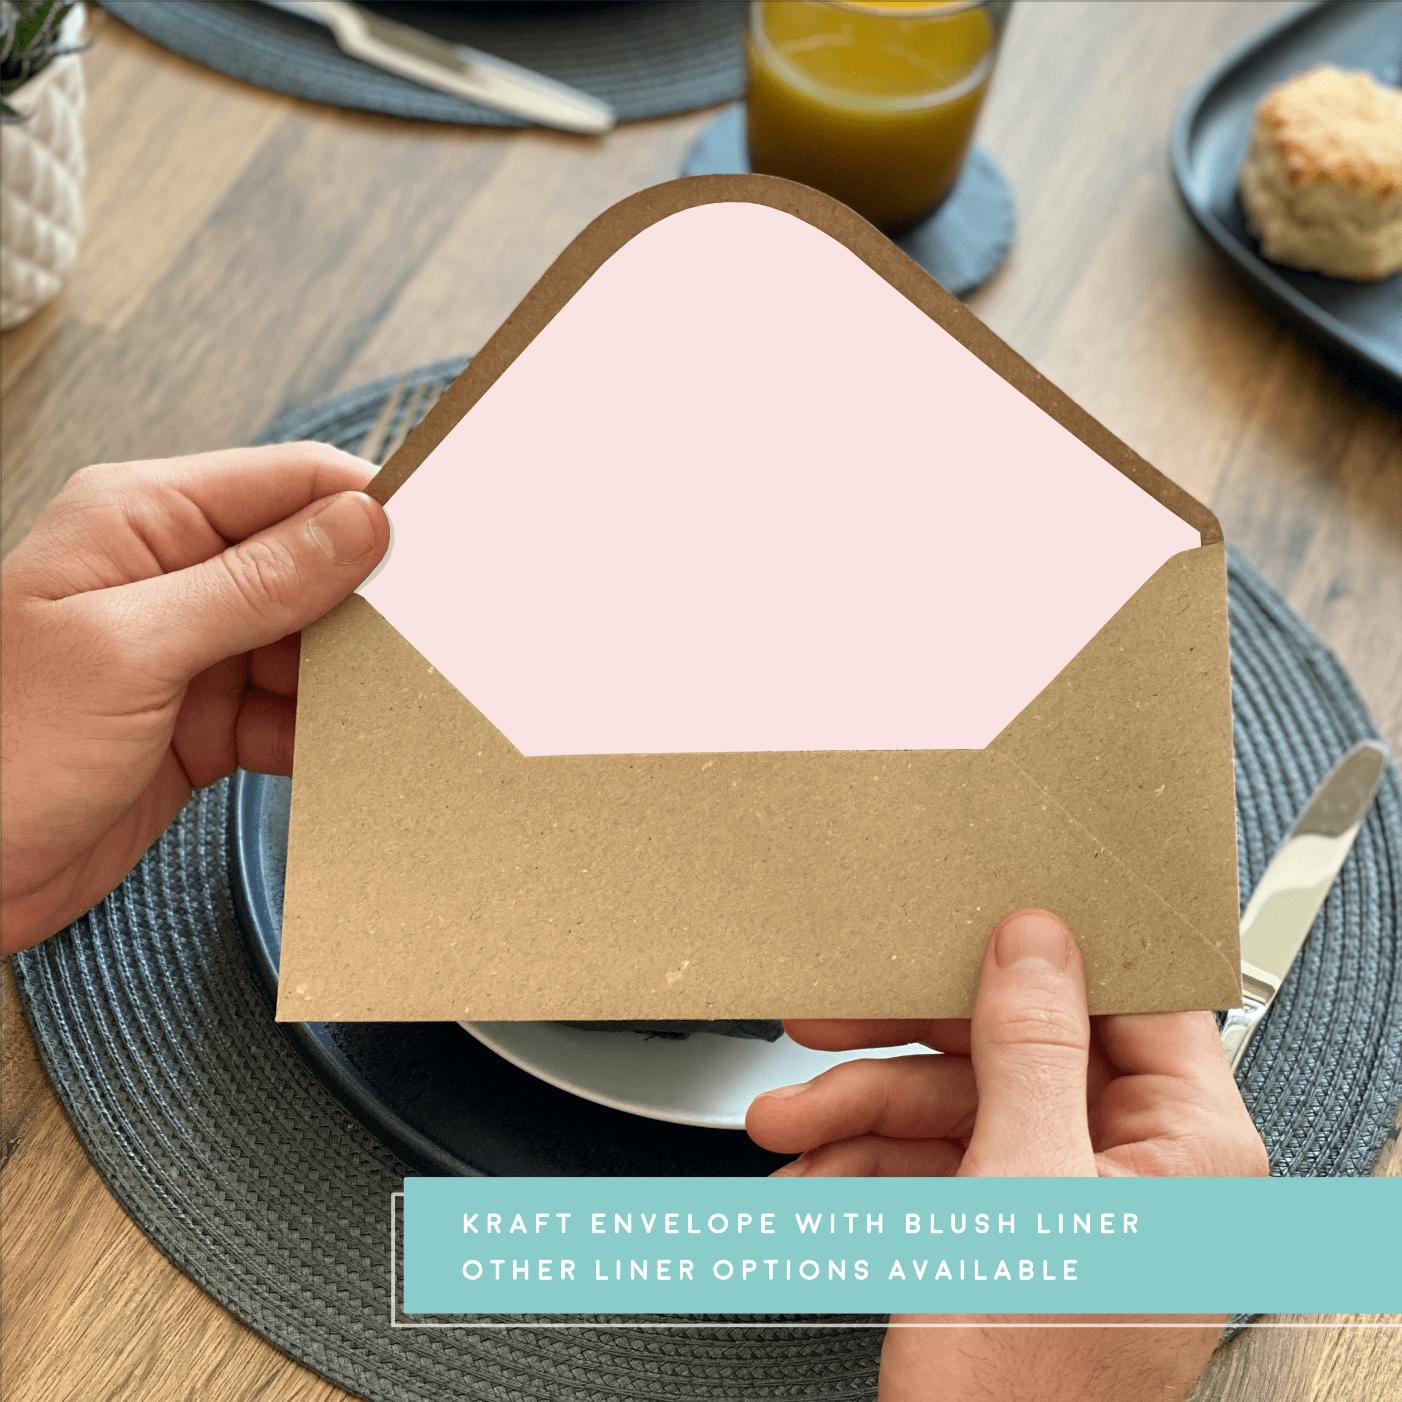 Rodo Creative Blush envelope liner - Kraft